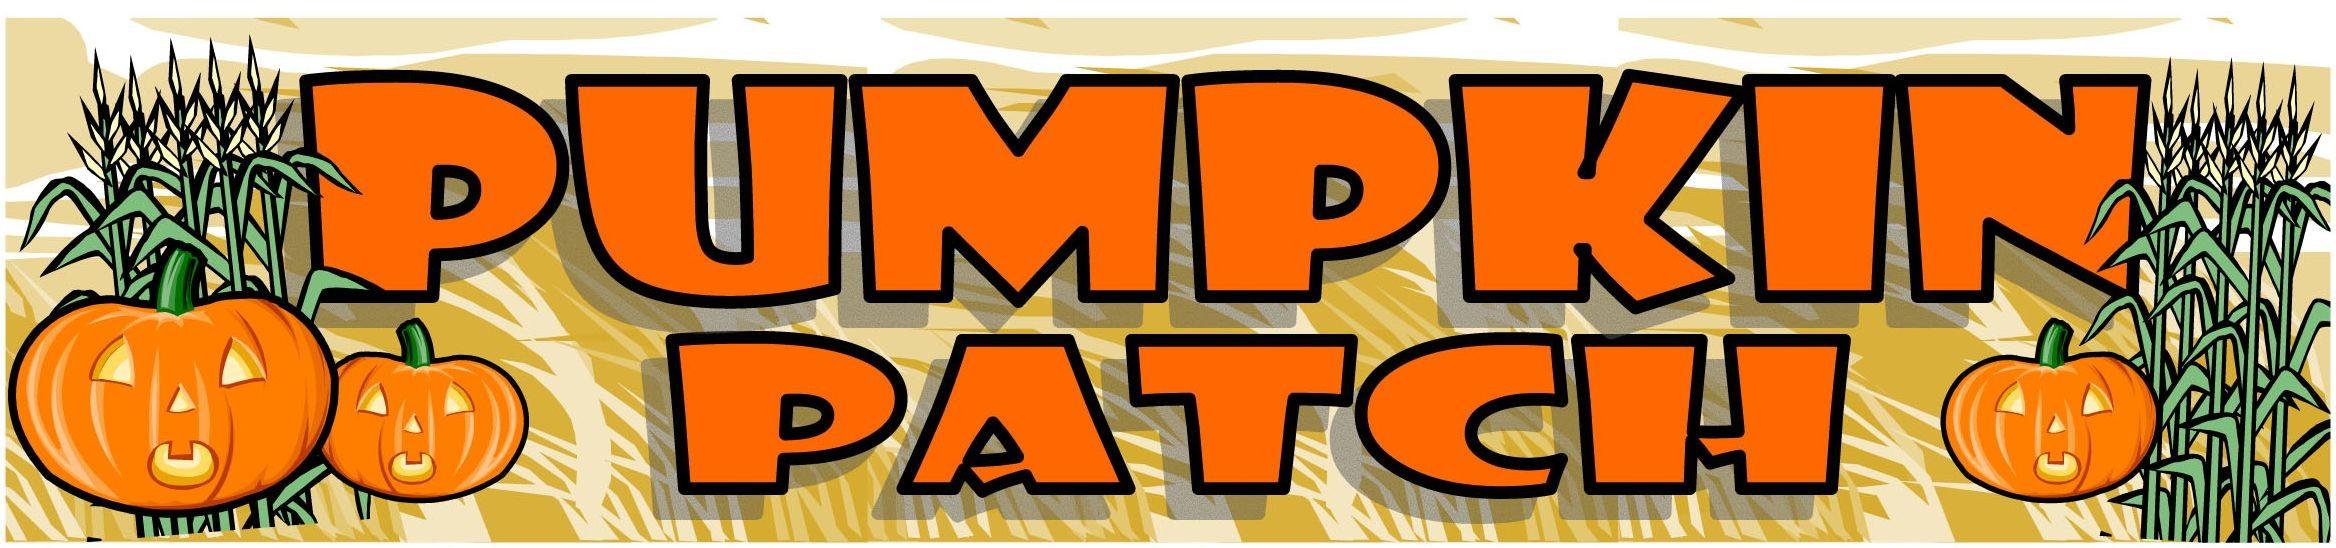 Pumpkin patch clipart tumundografico-Pumpkin patch clipart tumundografico-14